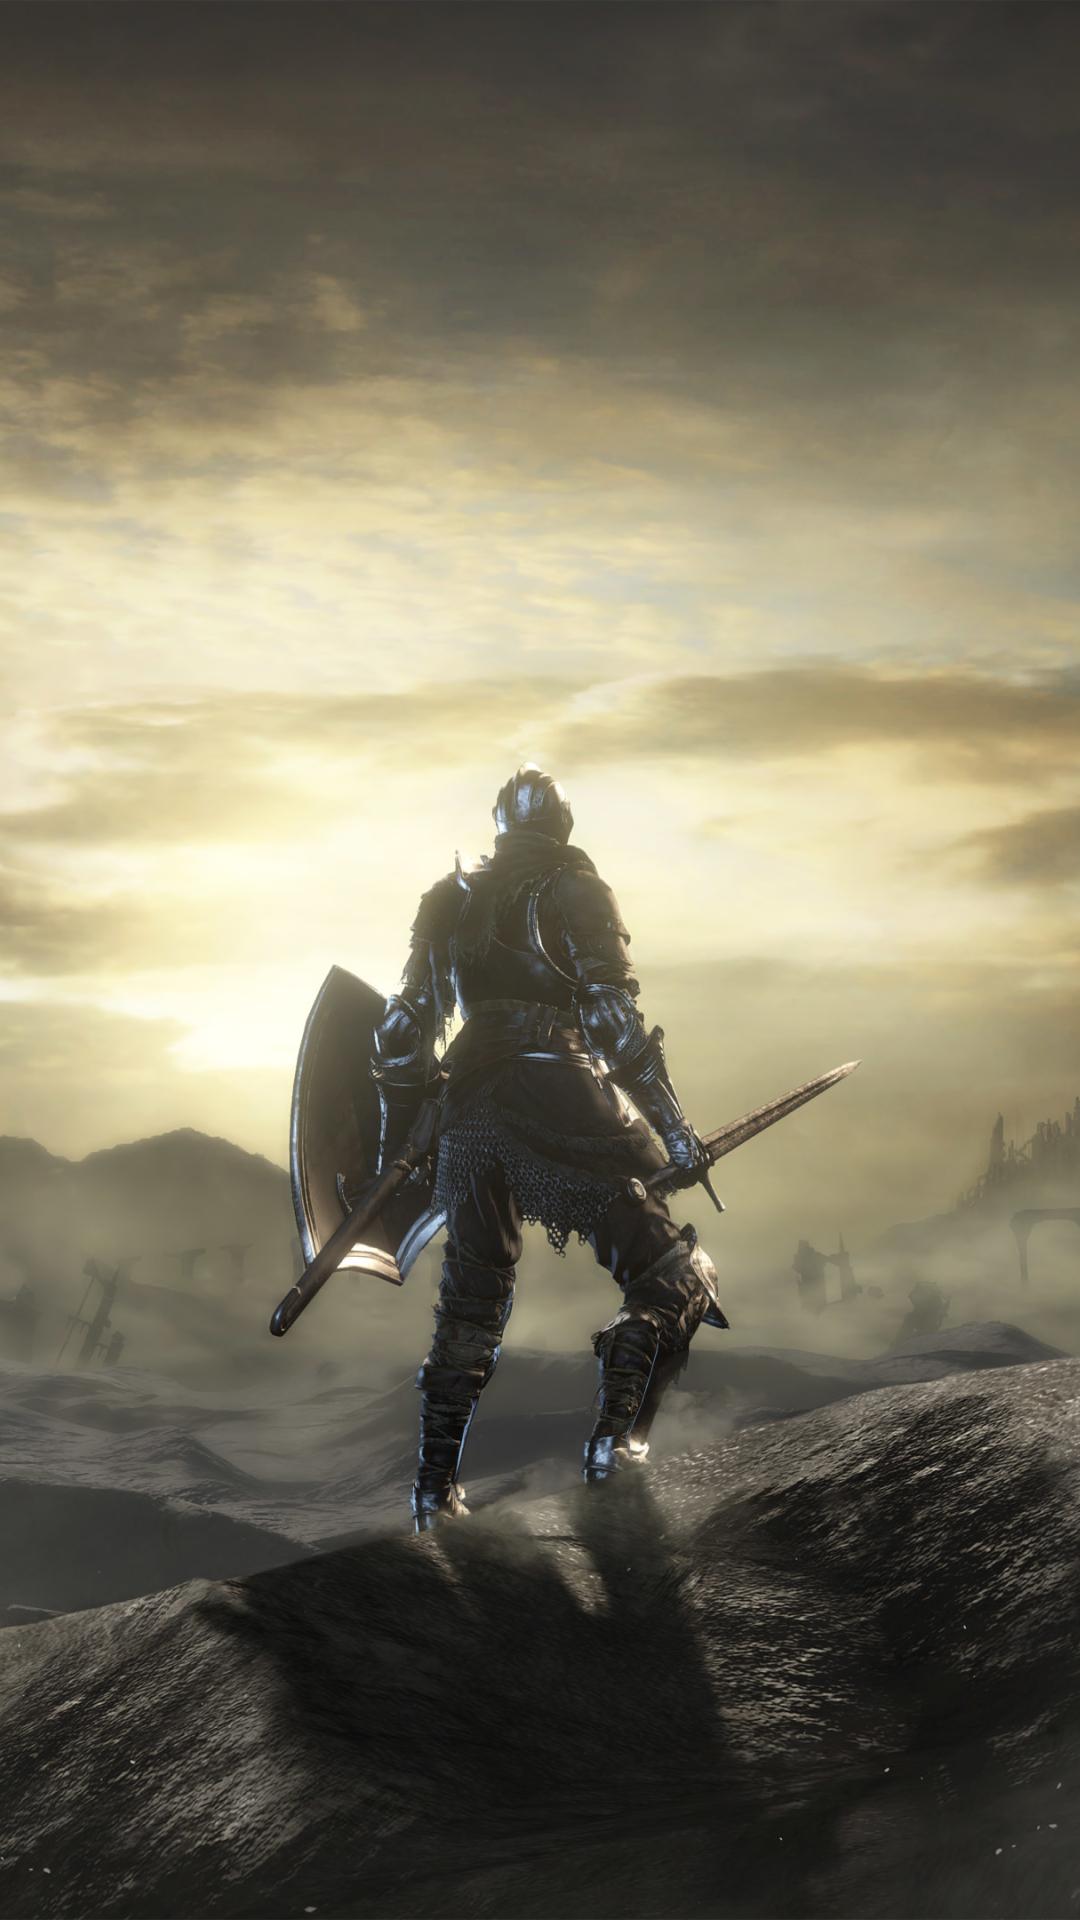 Dark Souls 3 Warrior Hd 4k Wallpaper